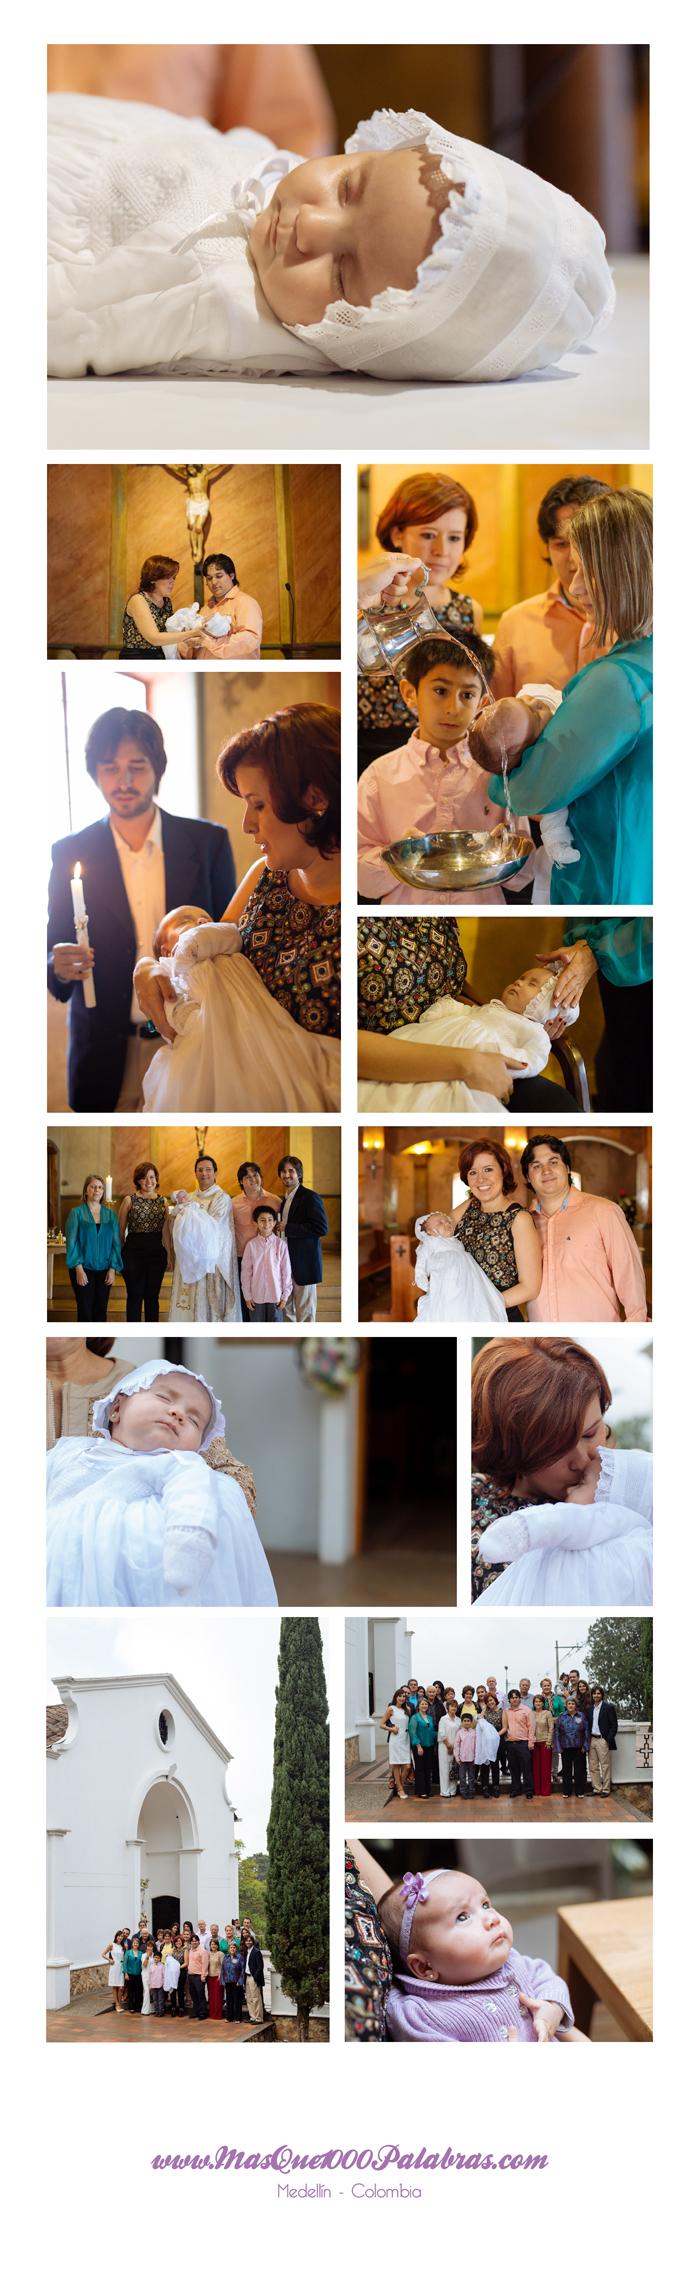 bautizo, purisima concepcion, medellin, fotografia, fotos, masque1000palabras